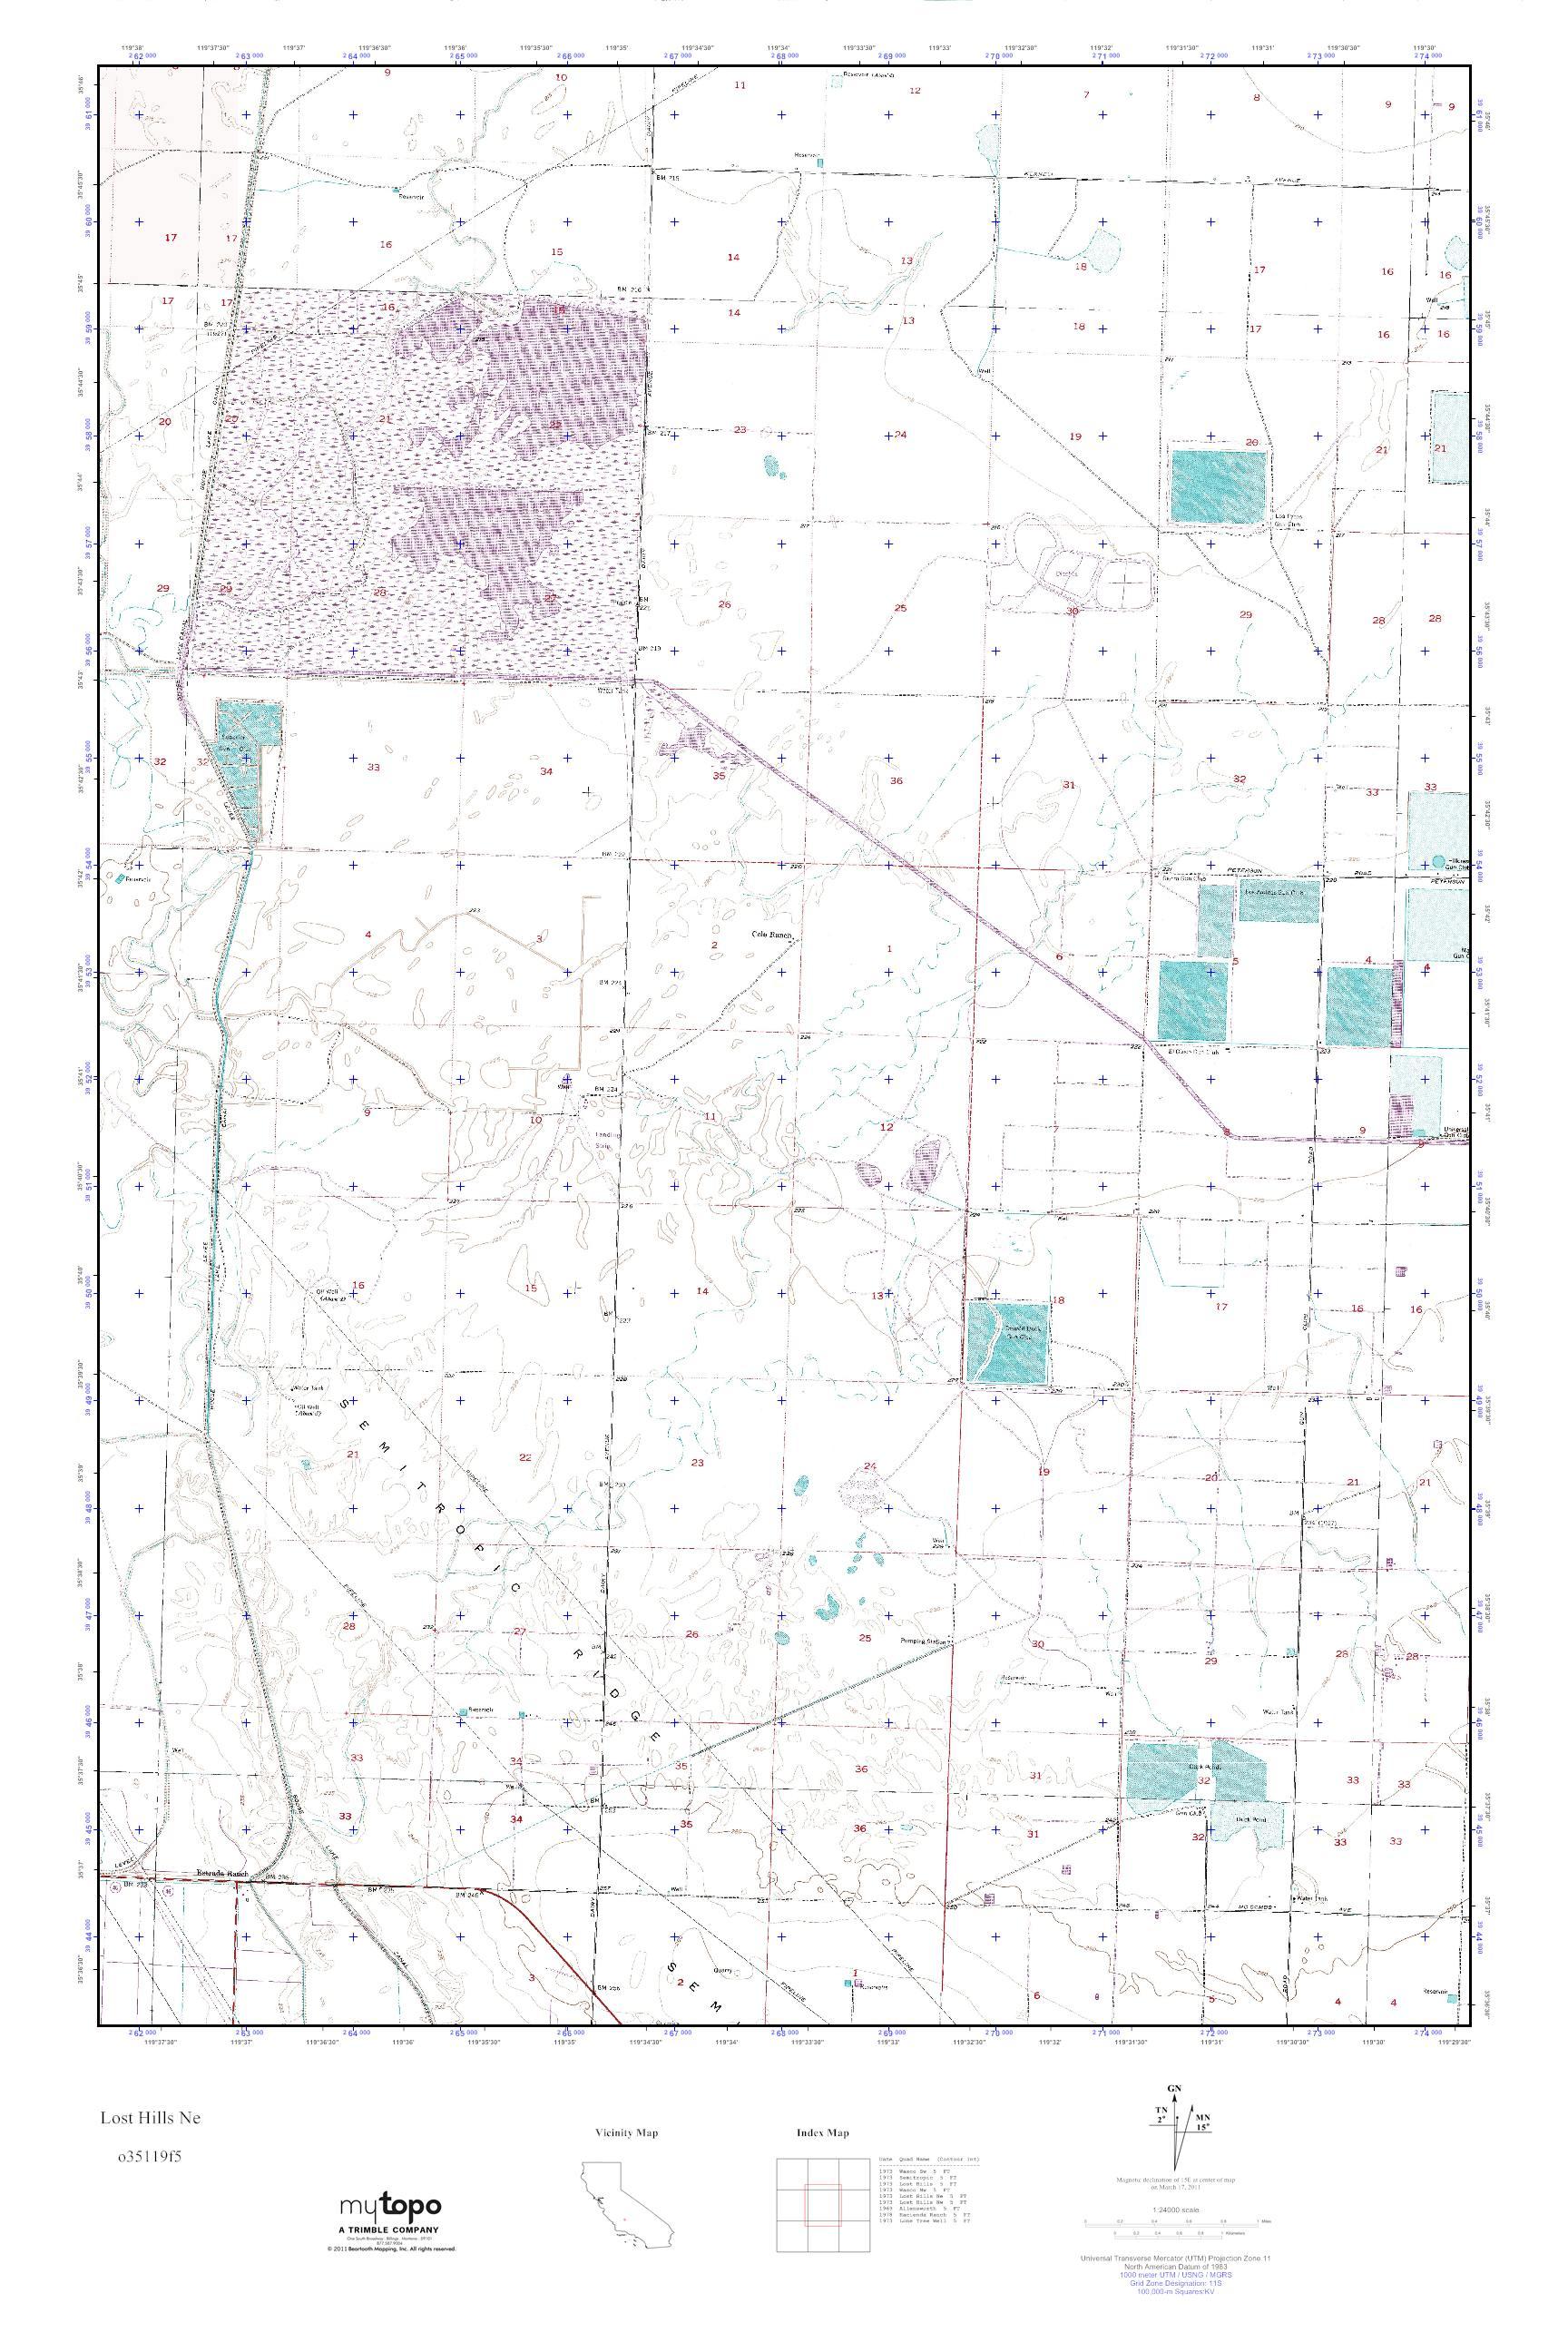 MyTopo Lost Hills Ne, California USGS Quad Topo Map